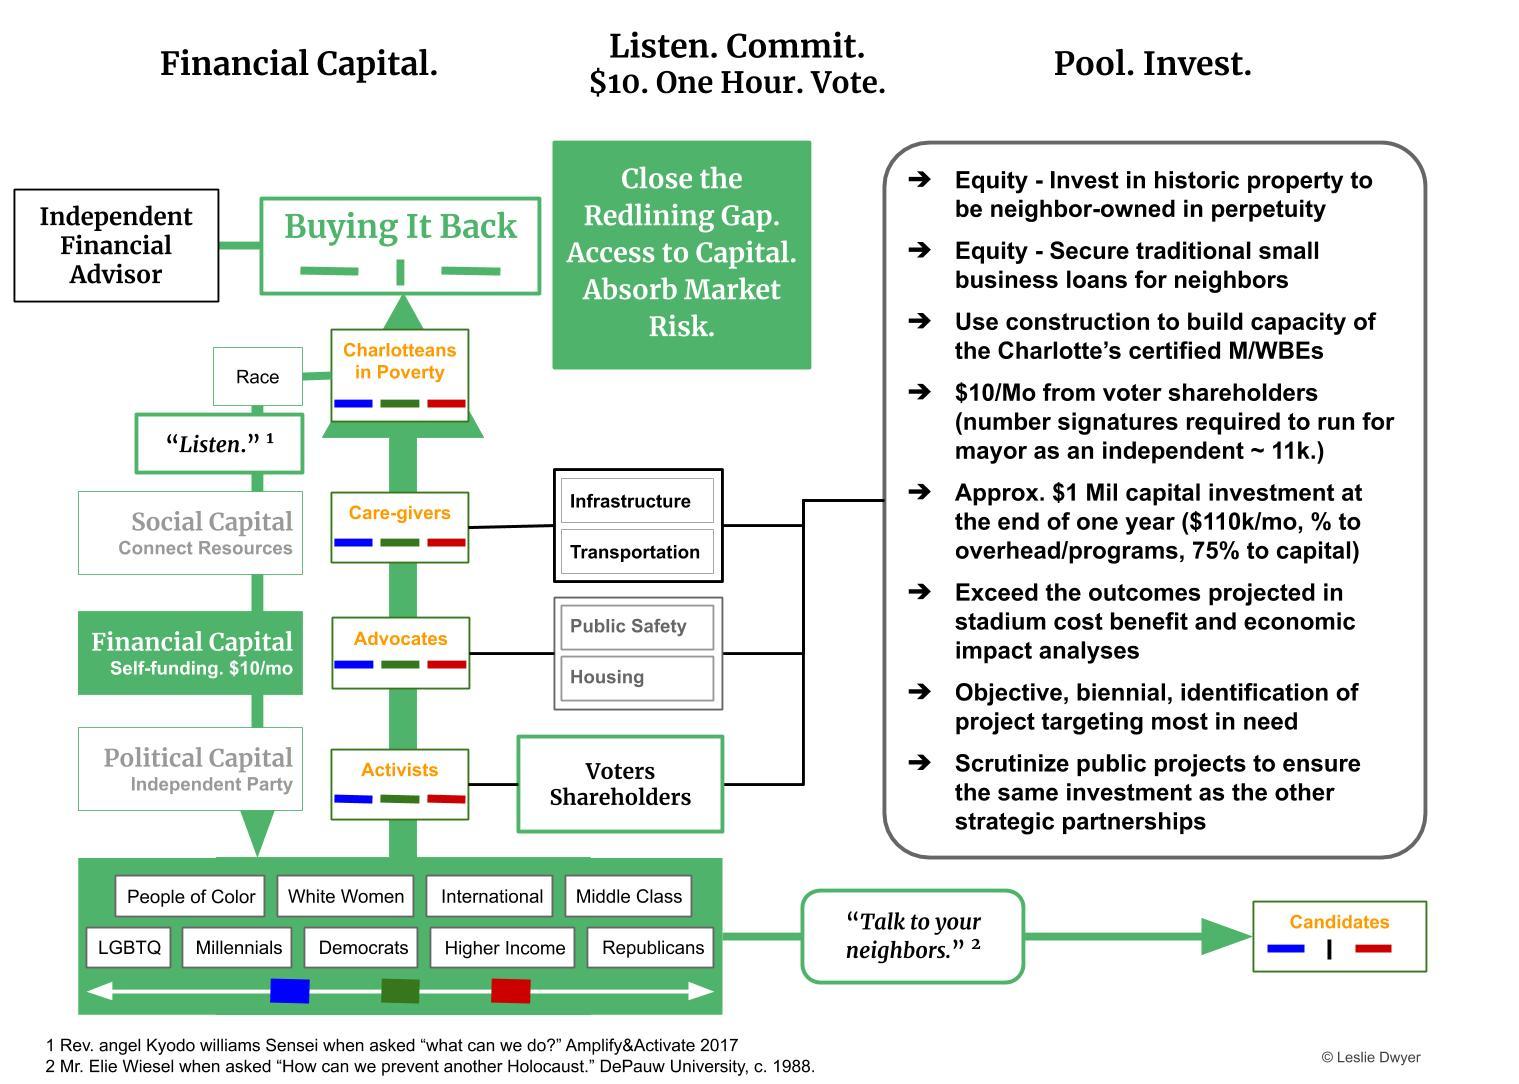 K2 Pool Financial Capital.jpg